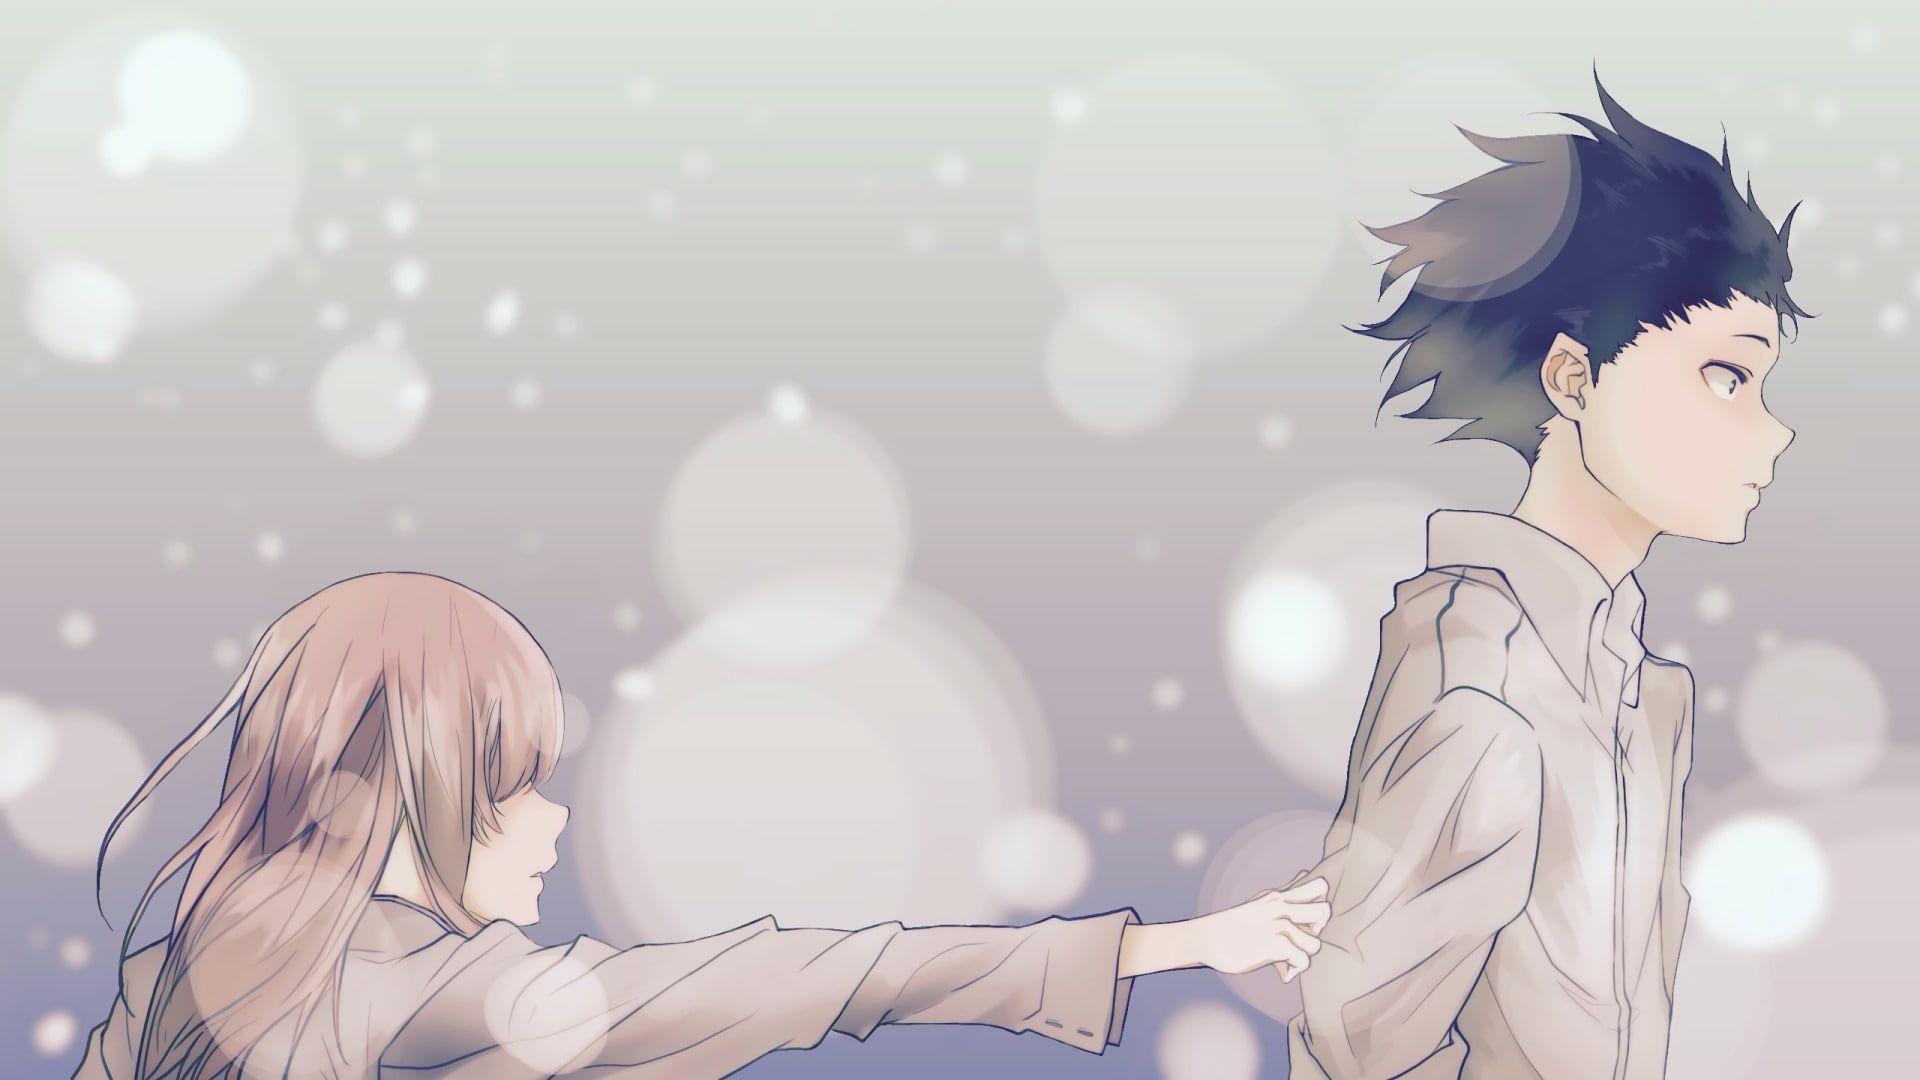 A Silent Voice wallpaper Anime Koe No Katachi Shouko